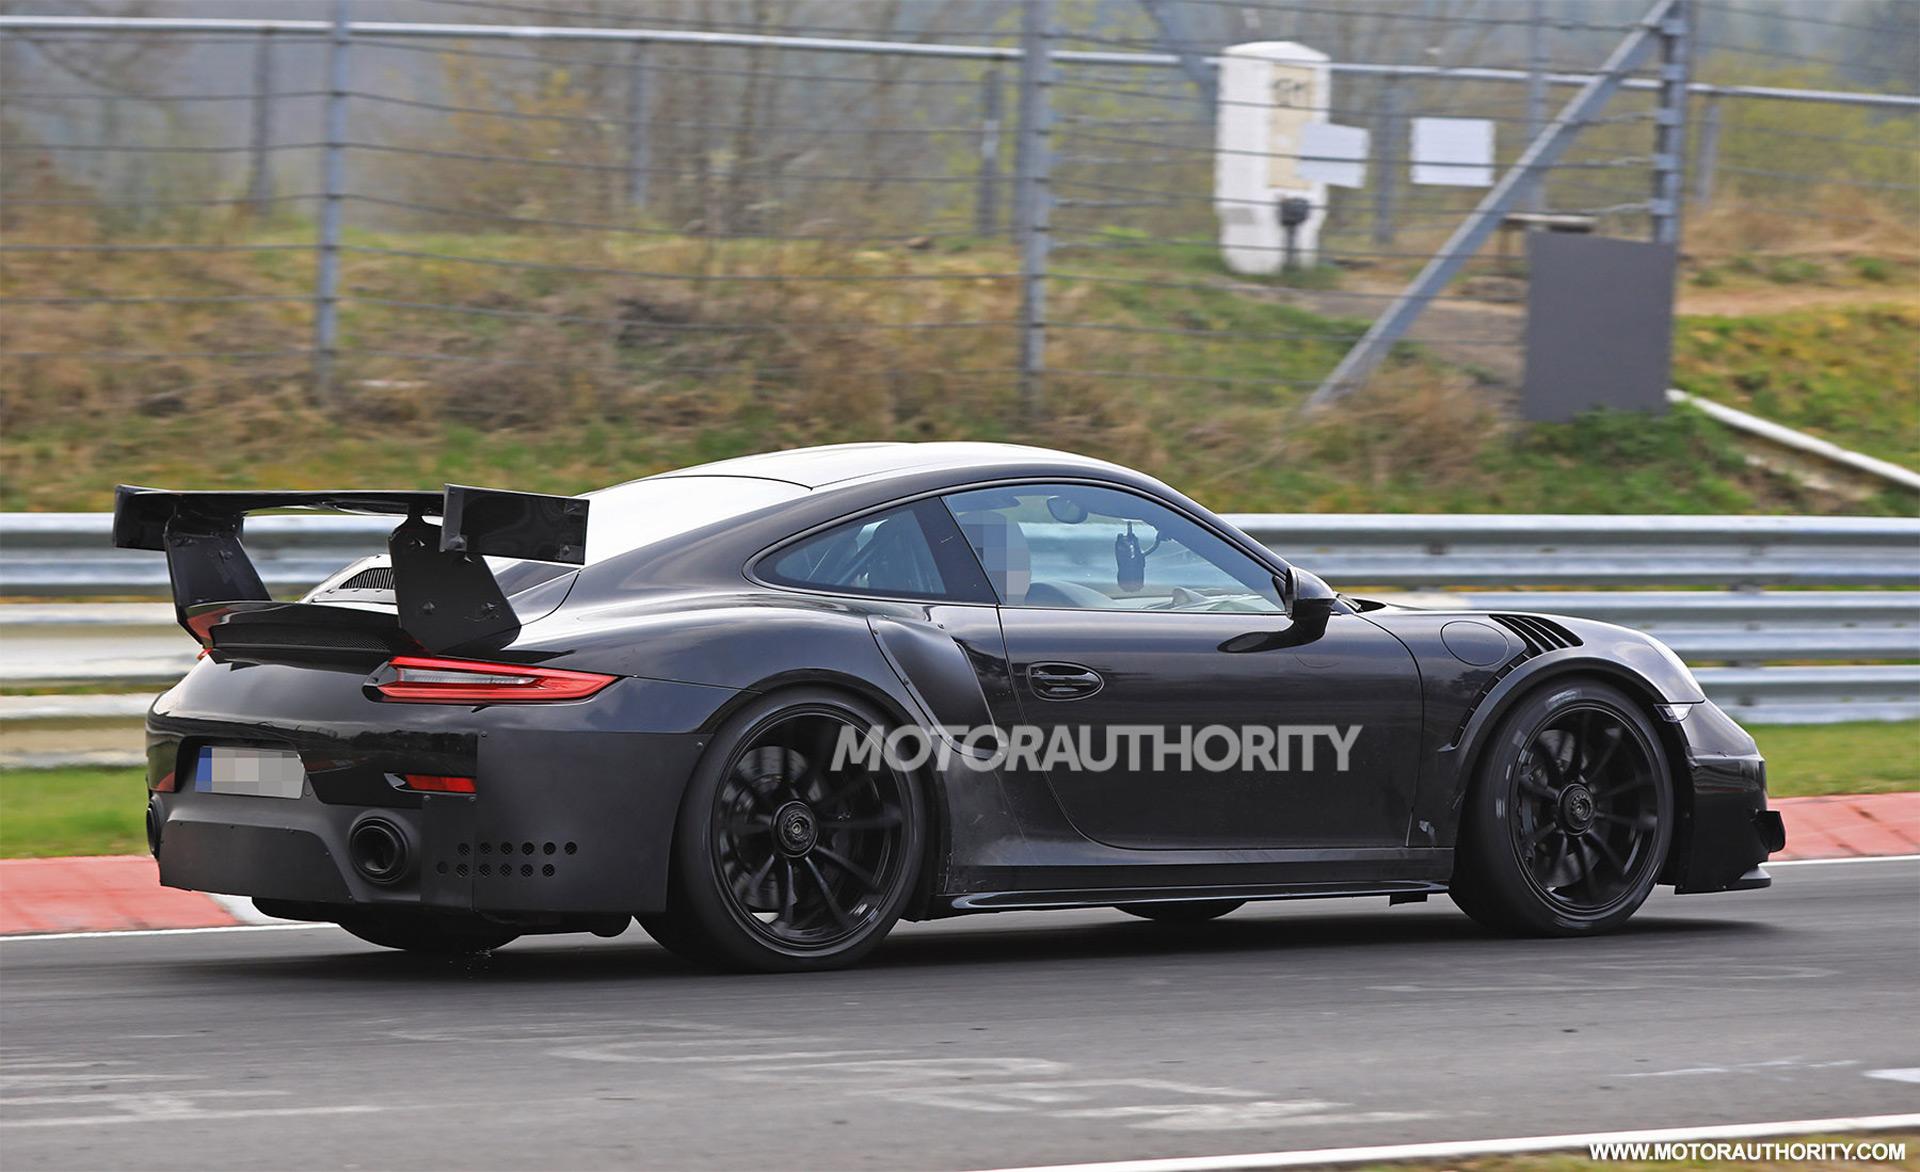 2018-porsche-911-gt2-spy-shots--image-via-s-baldauf-sb-medien_100599784_h Cozy Porsche 911 Gt2 Rs Turbo Price Cars Trend